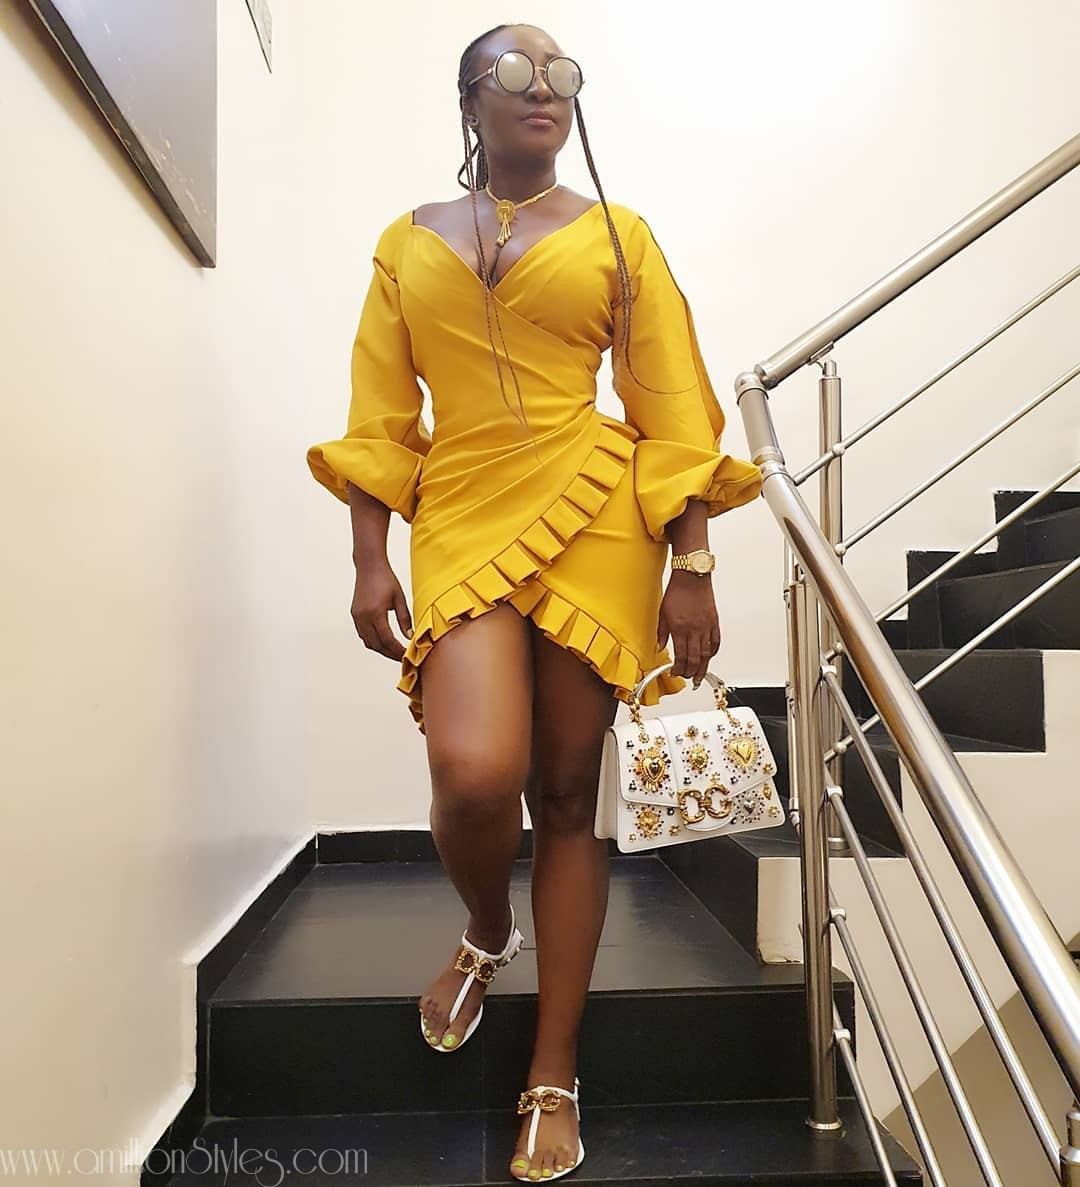 Ini Edo, The Brown Skinned Fashionista